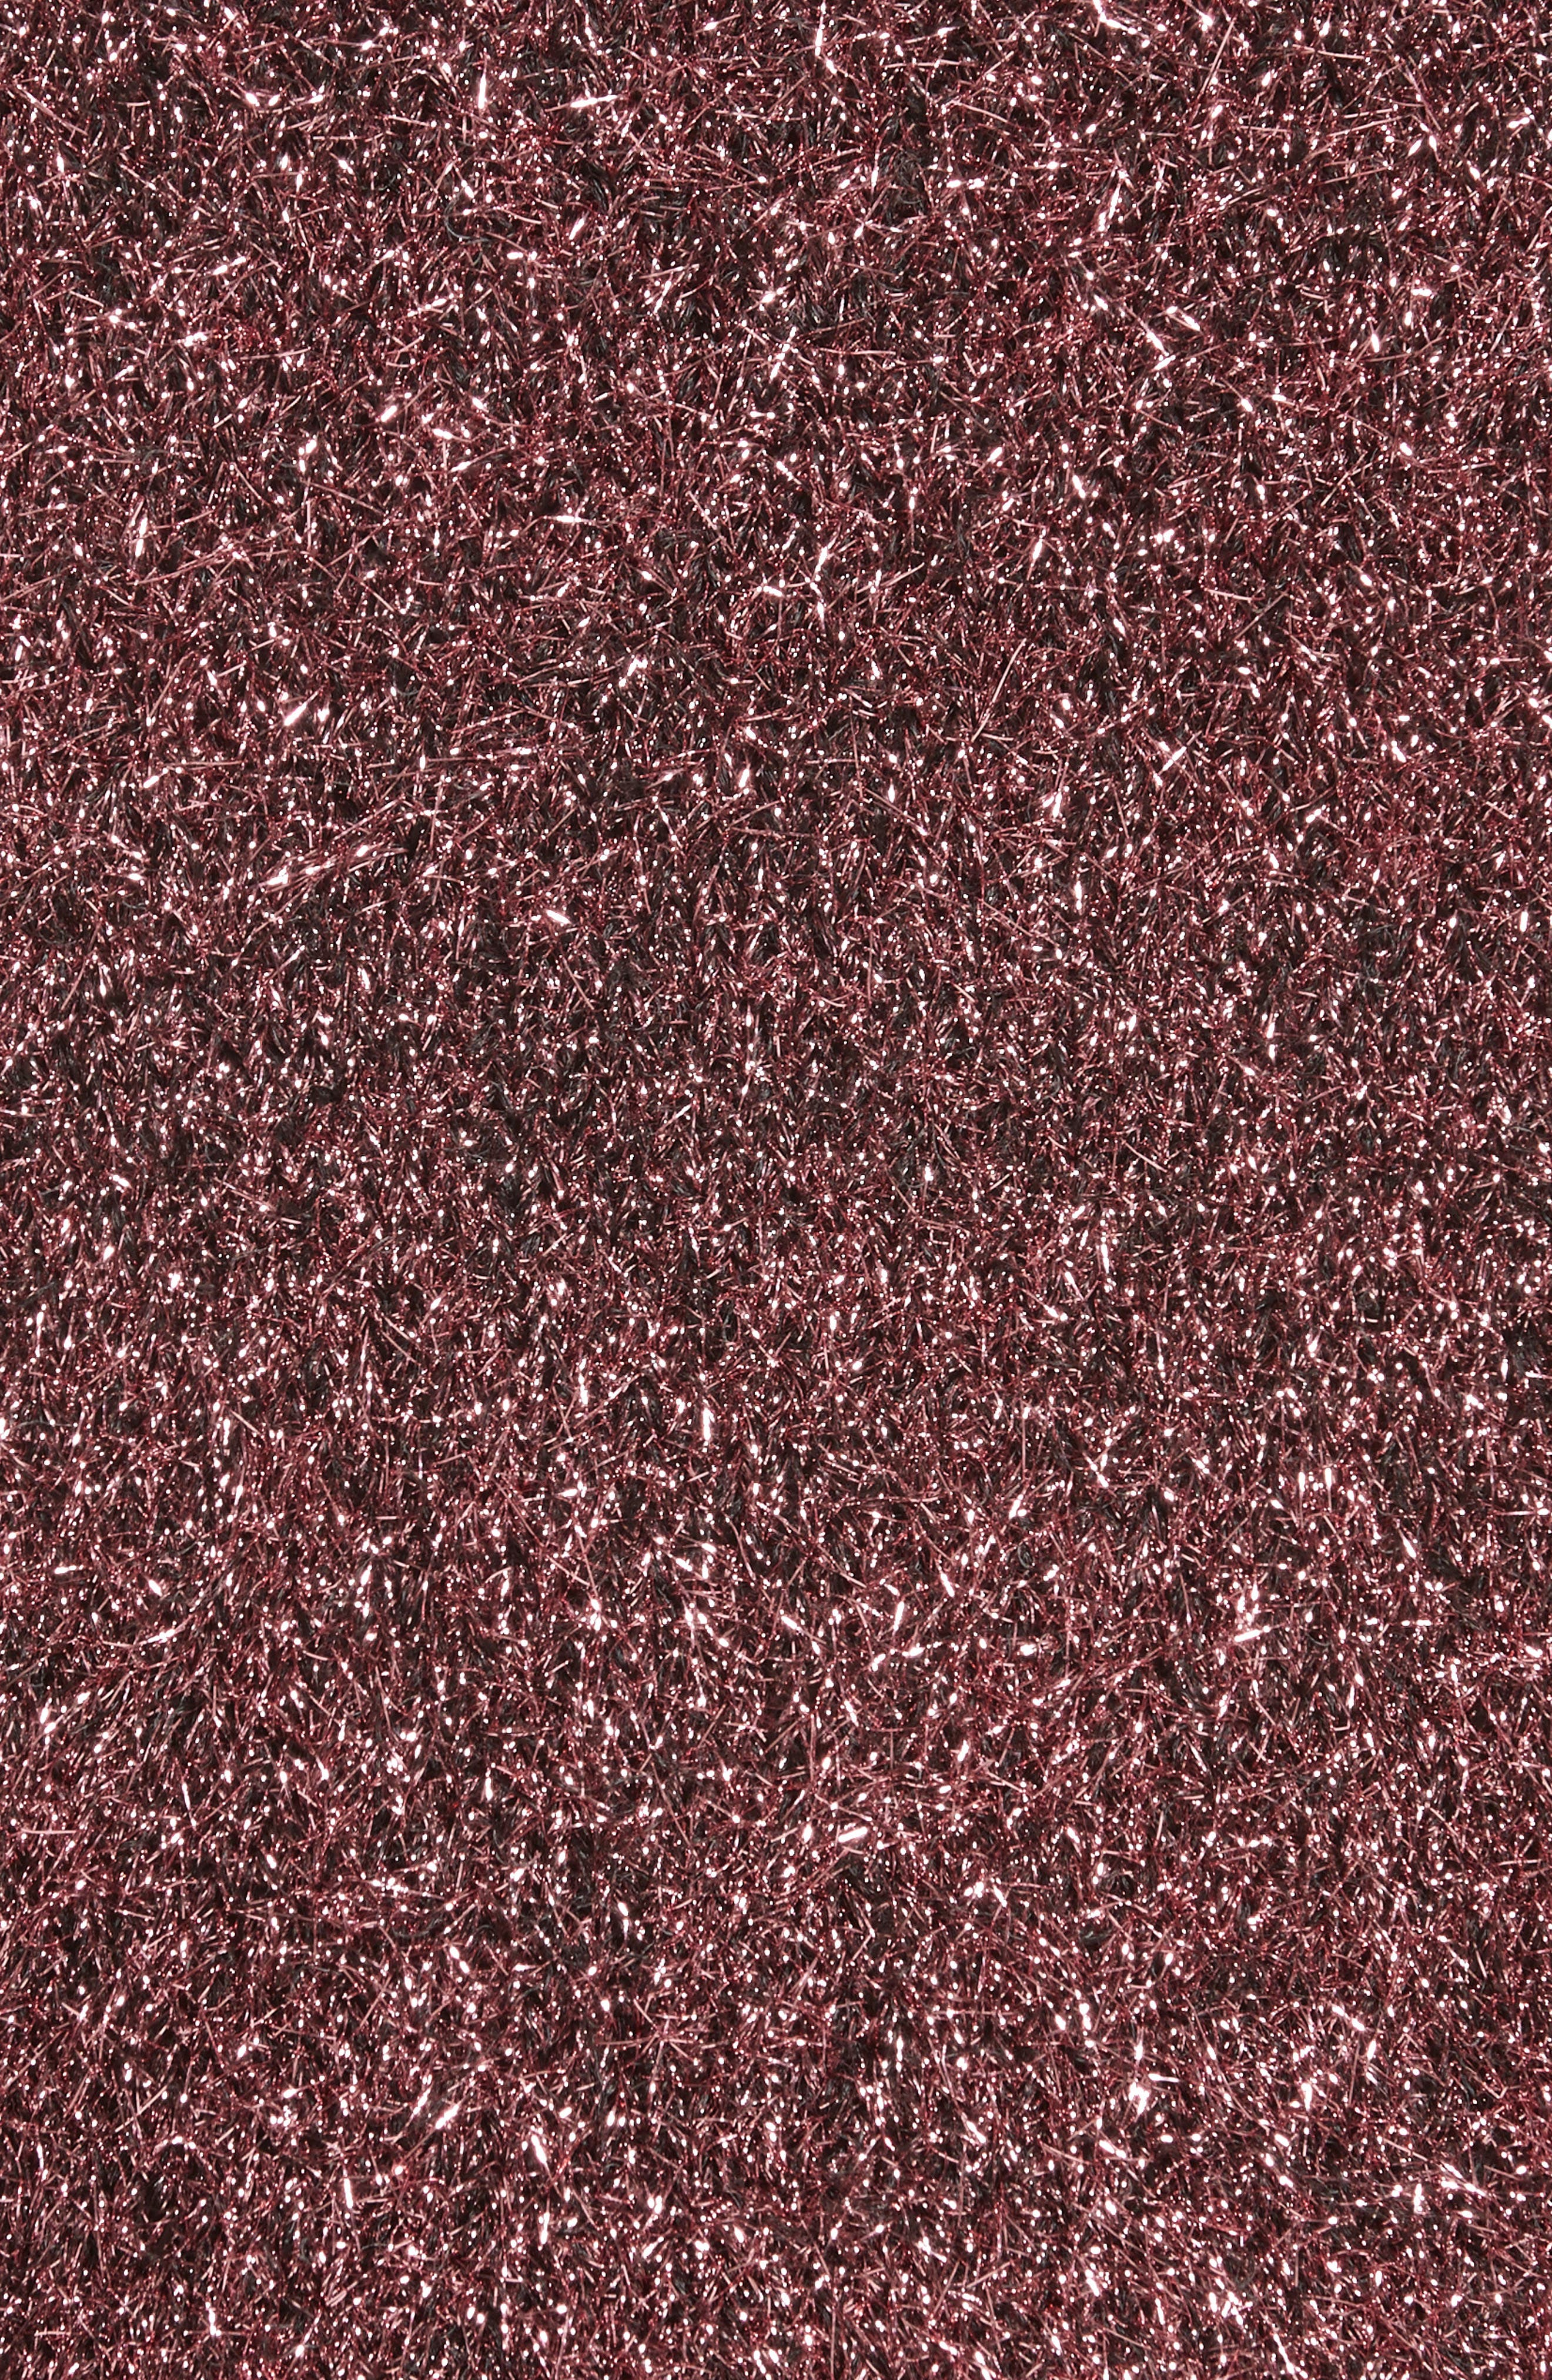 Vaporize Textured Metallic Sweater,                             Alternate thumbnail 5, color,                             Pink